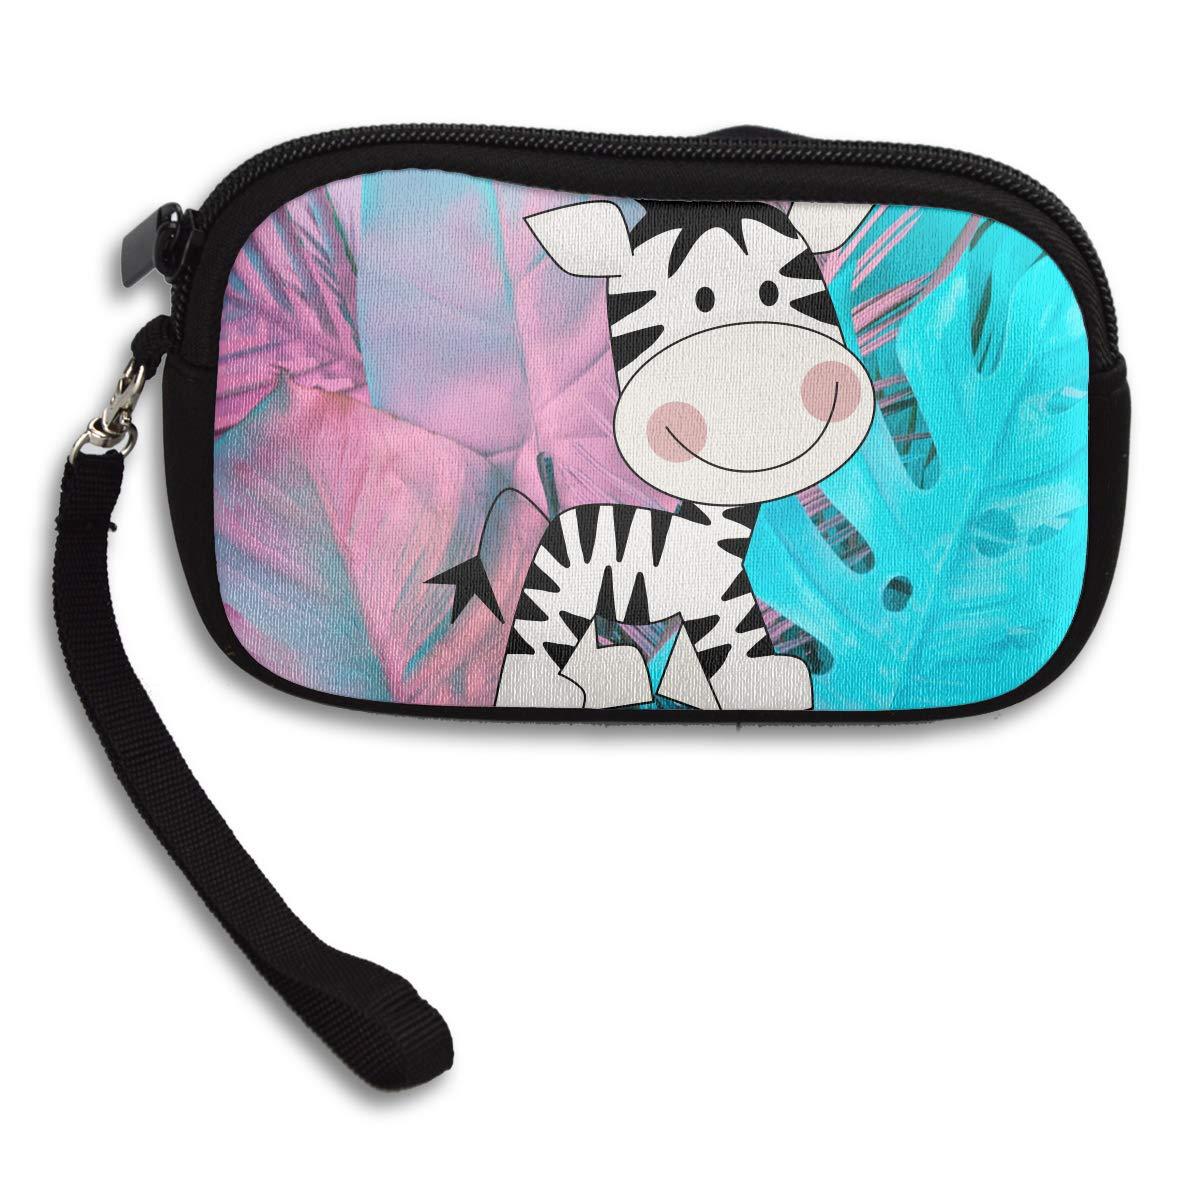 Zebra Baby Deluxe Printing Small Purse Portable Receiving Bag